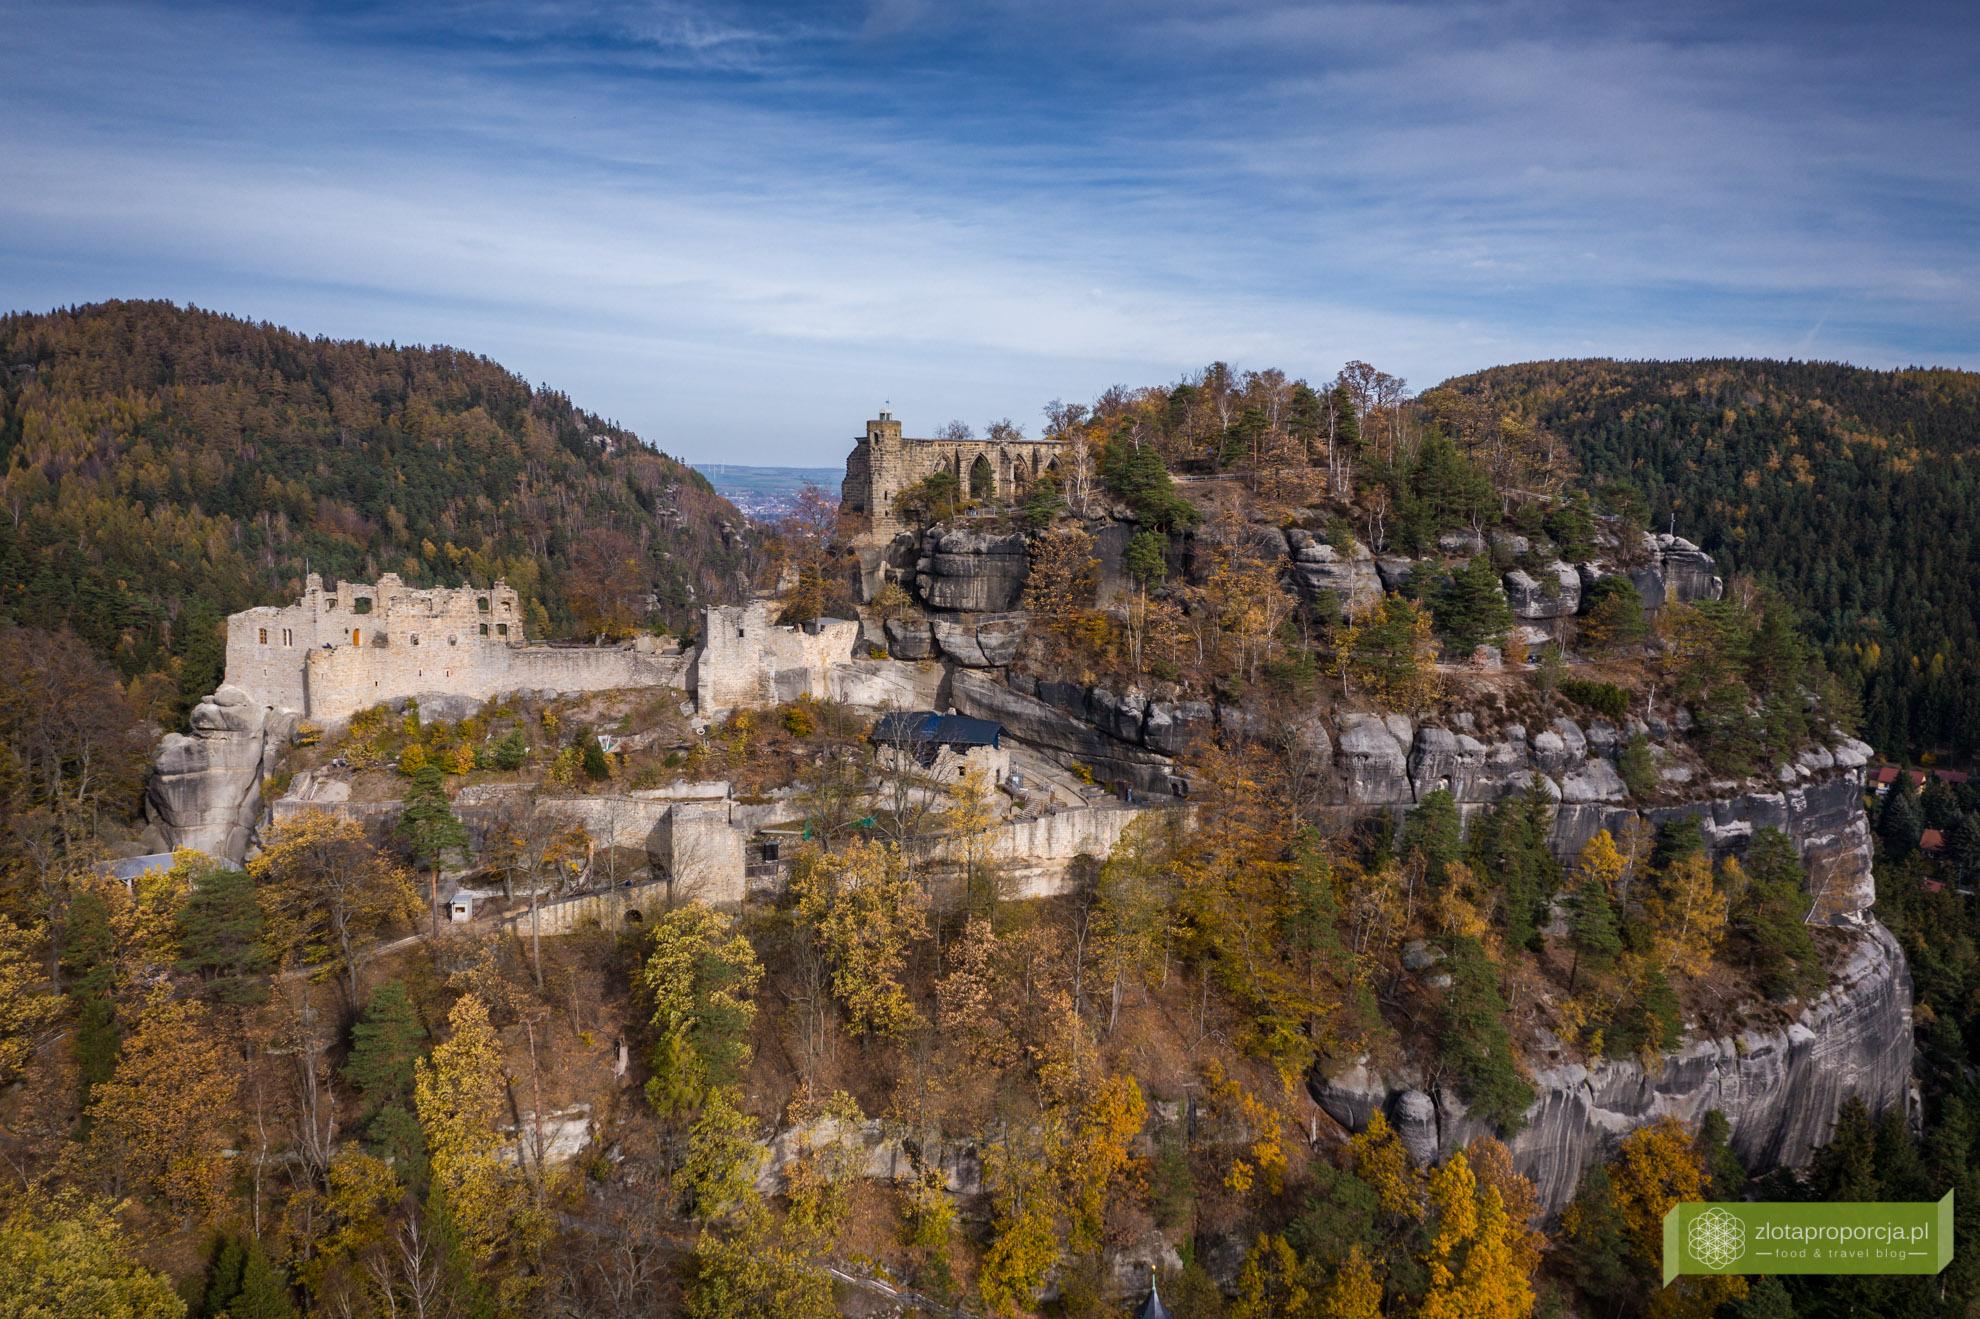 Oybin, klasztro Oybin, ruiny Oybin, Góry Żytawskie, Saksonia, atrakcje Saksonii